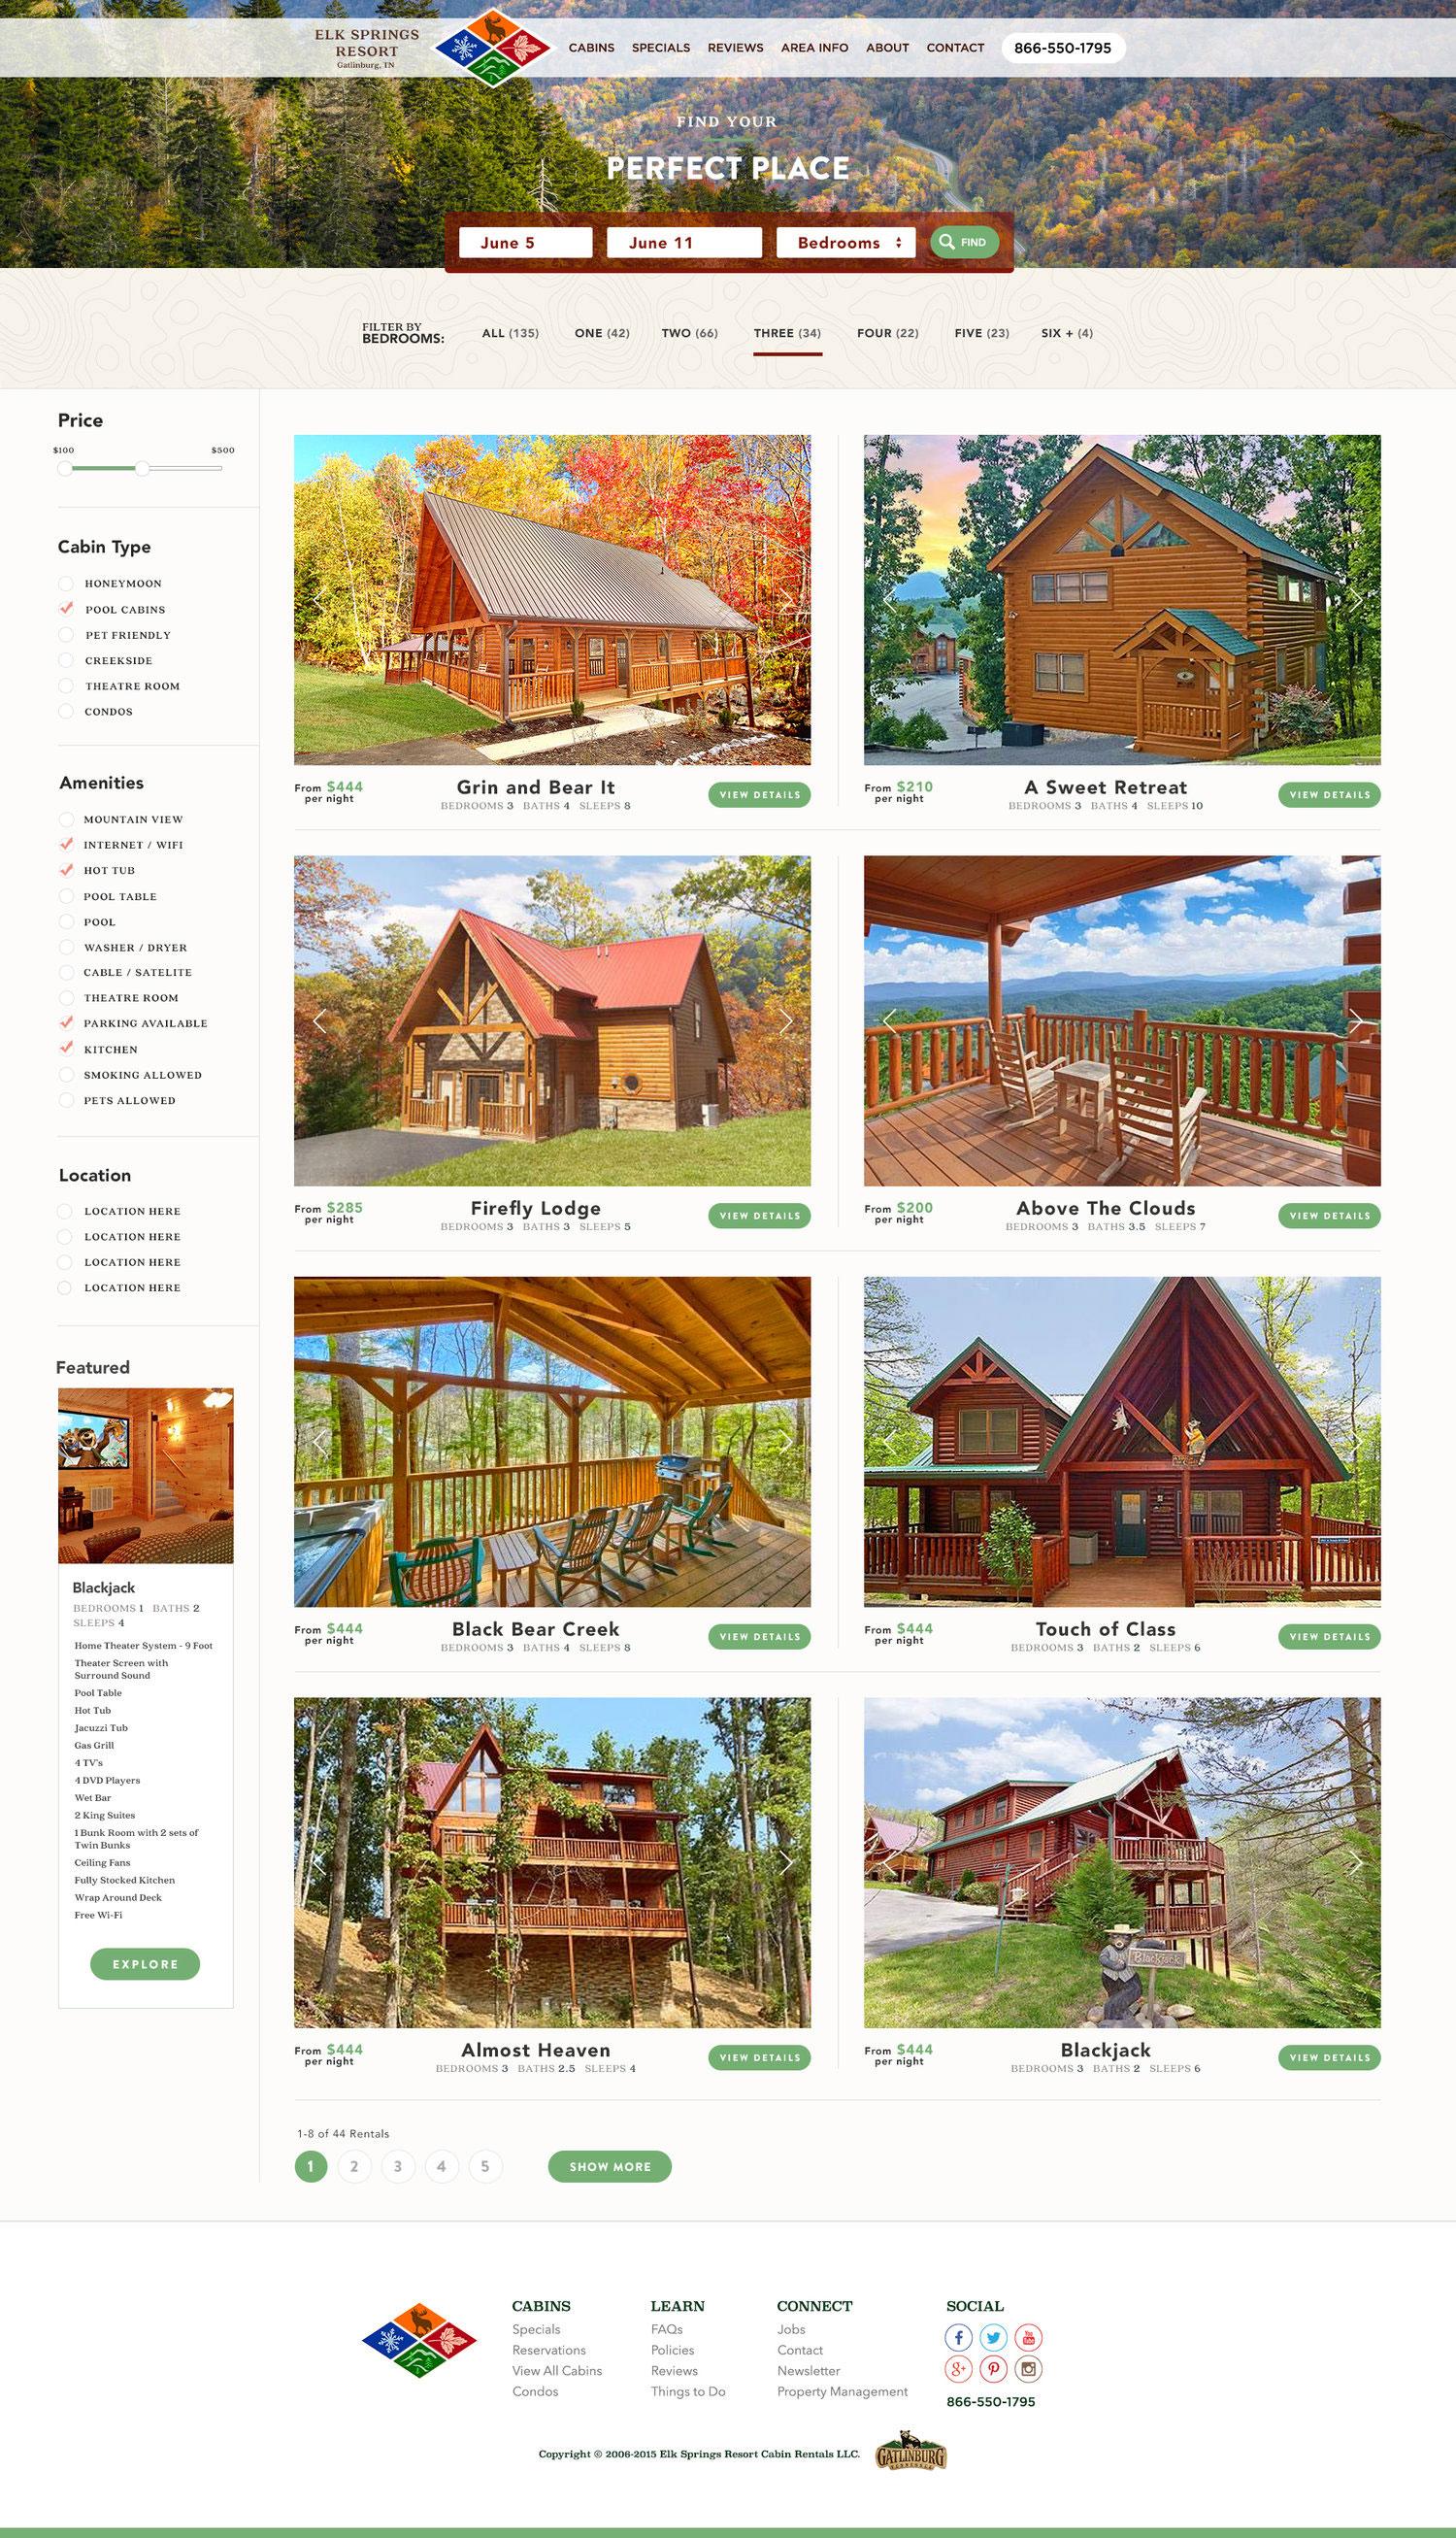 Web Design | Elk Springs Resort - Perfect Place Full Page